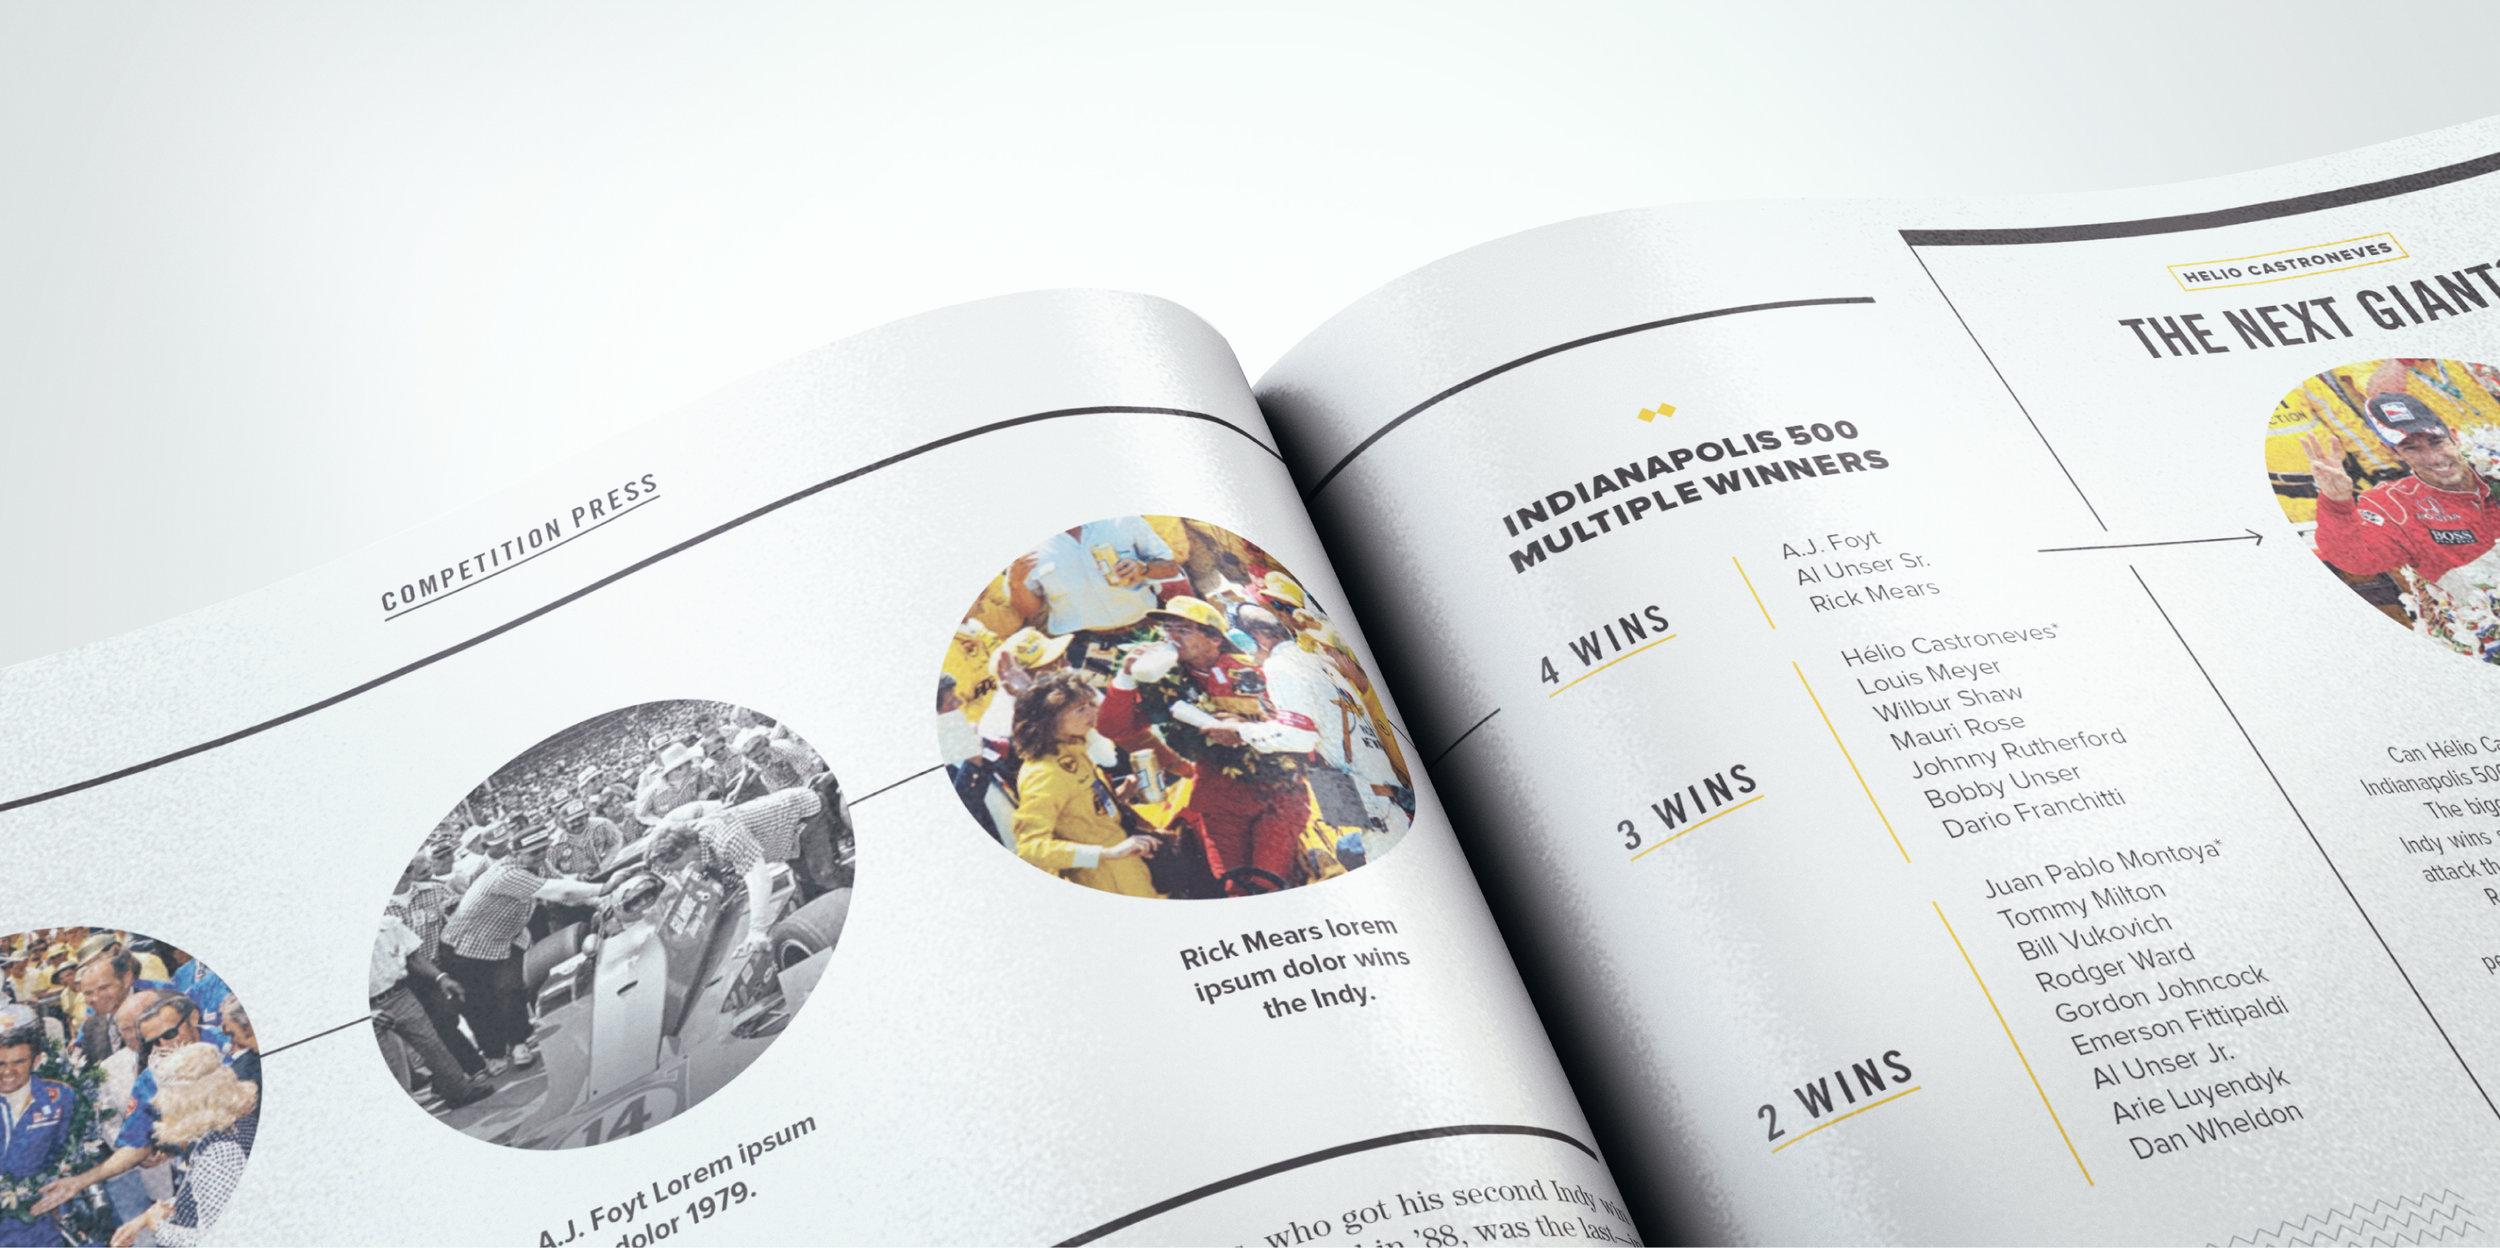 autoweek-magazine-mockup2@2x-100.jpg